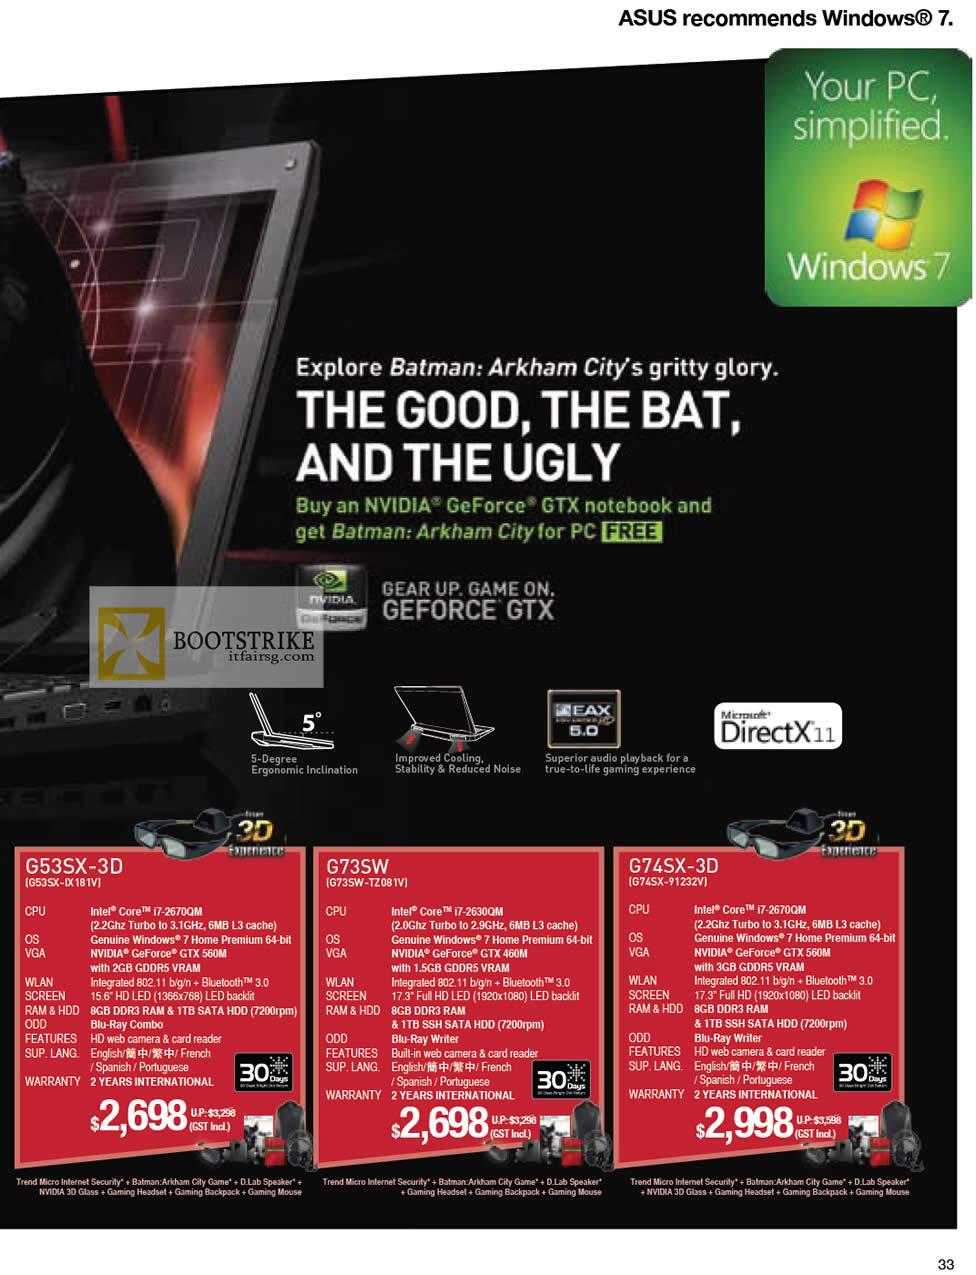 IT SHOW 2012 price list image brochure of ASUS Notebooks Gaming G53SX-IX181V, G73SW-TZ081V, G74SX-91232V